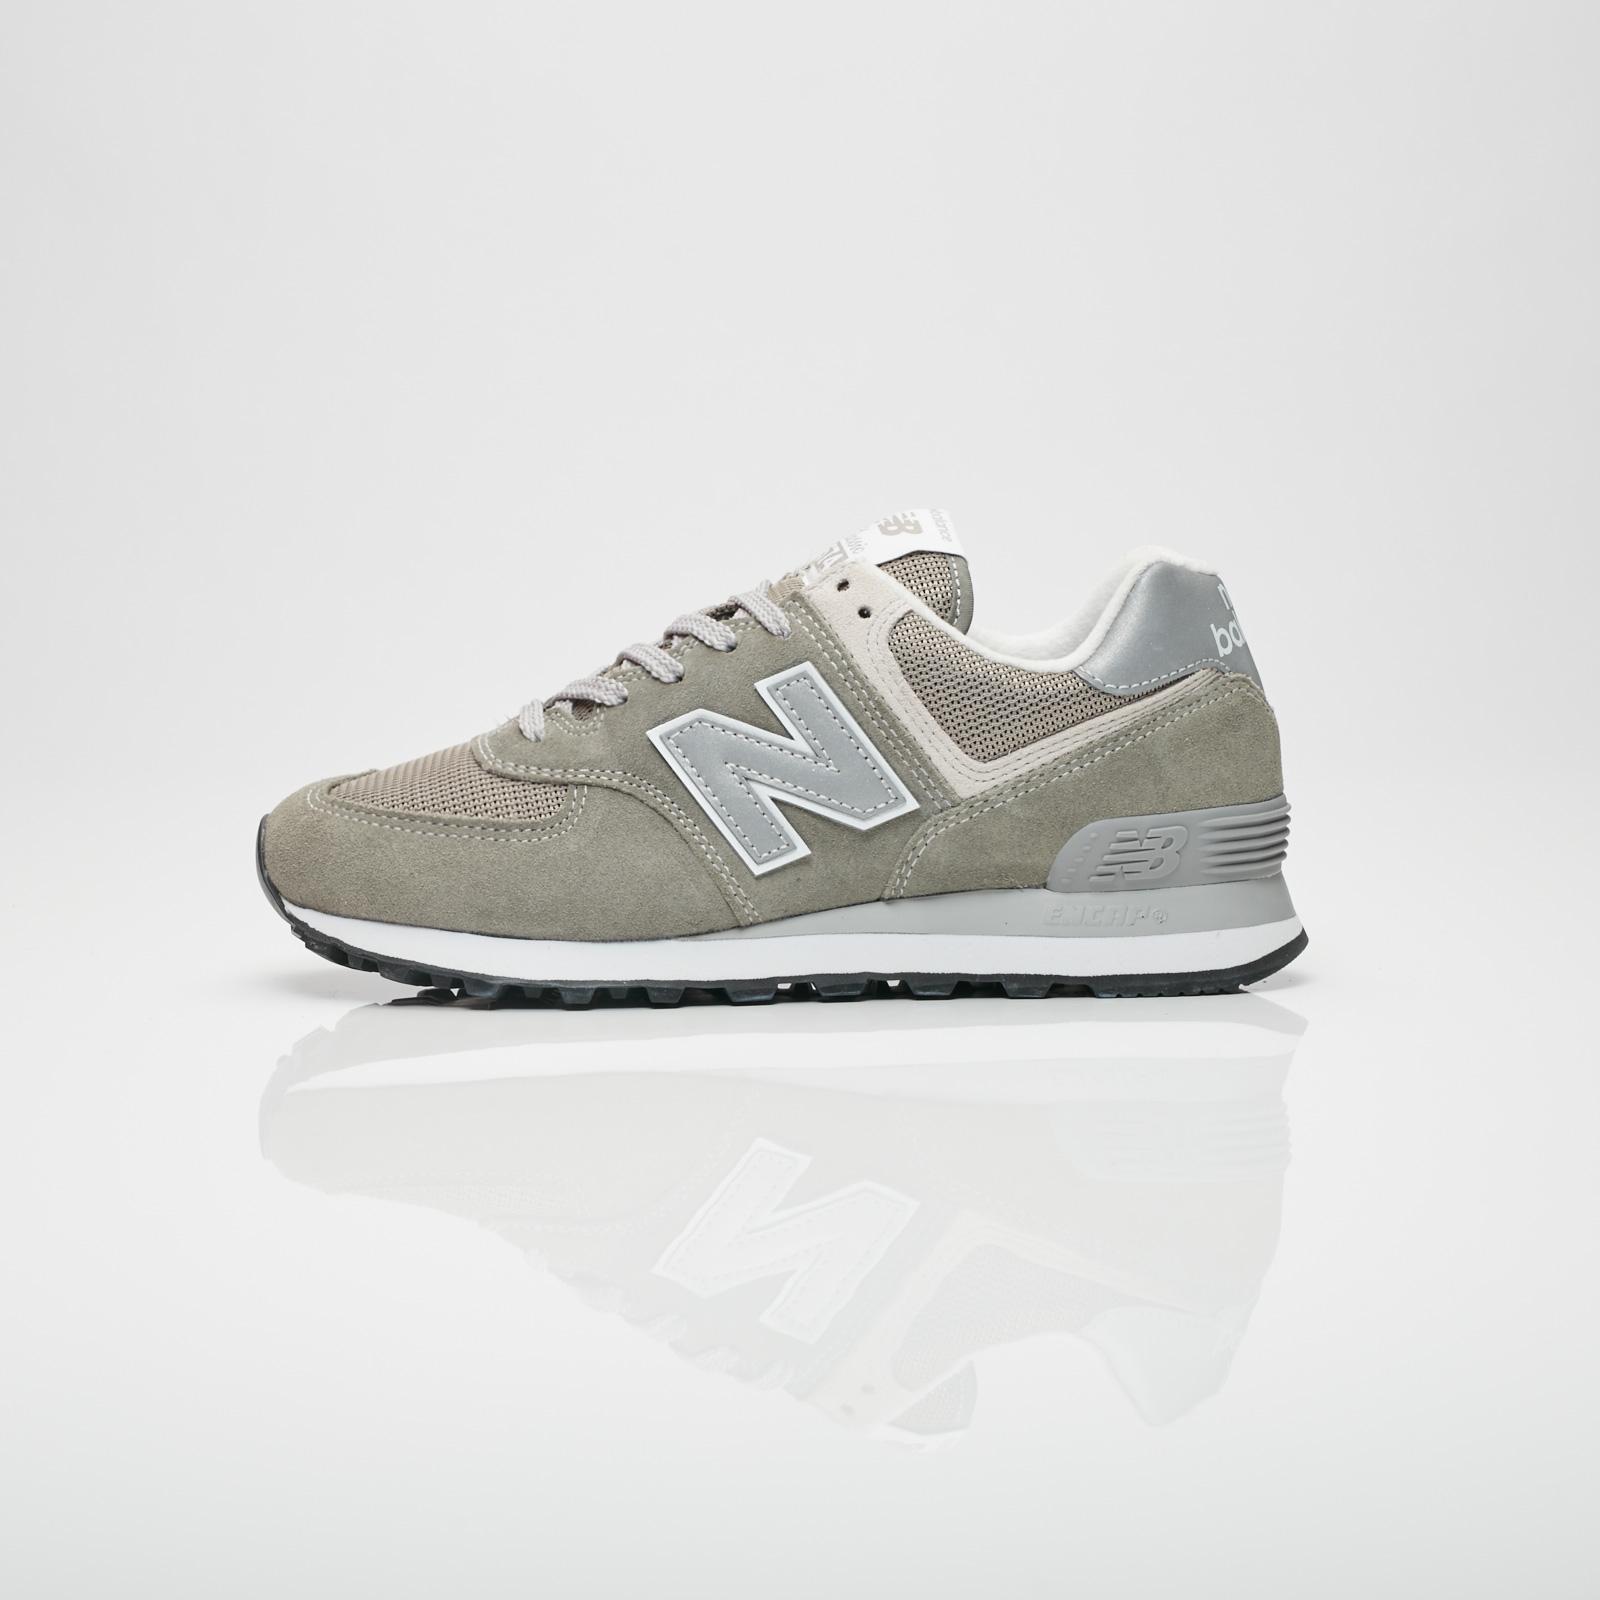 promo code 32e94 166ac New Balance WL574EG - Wl574eg - Sneakersnstuff | sneakers ...